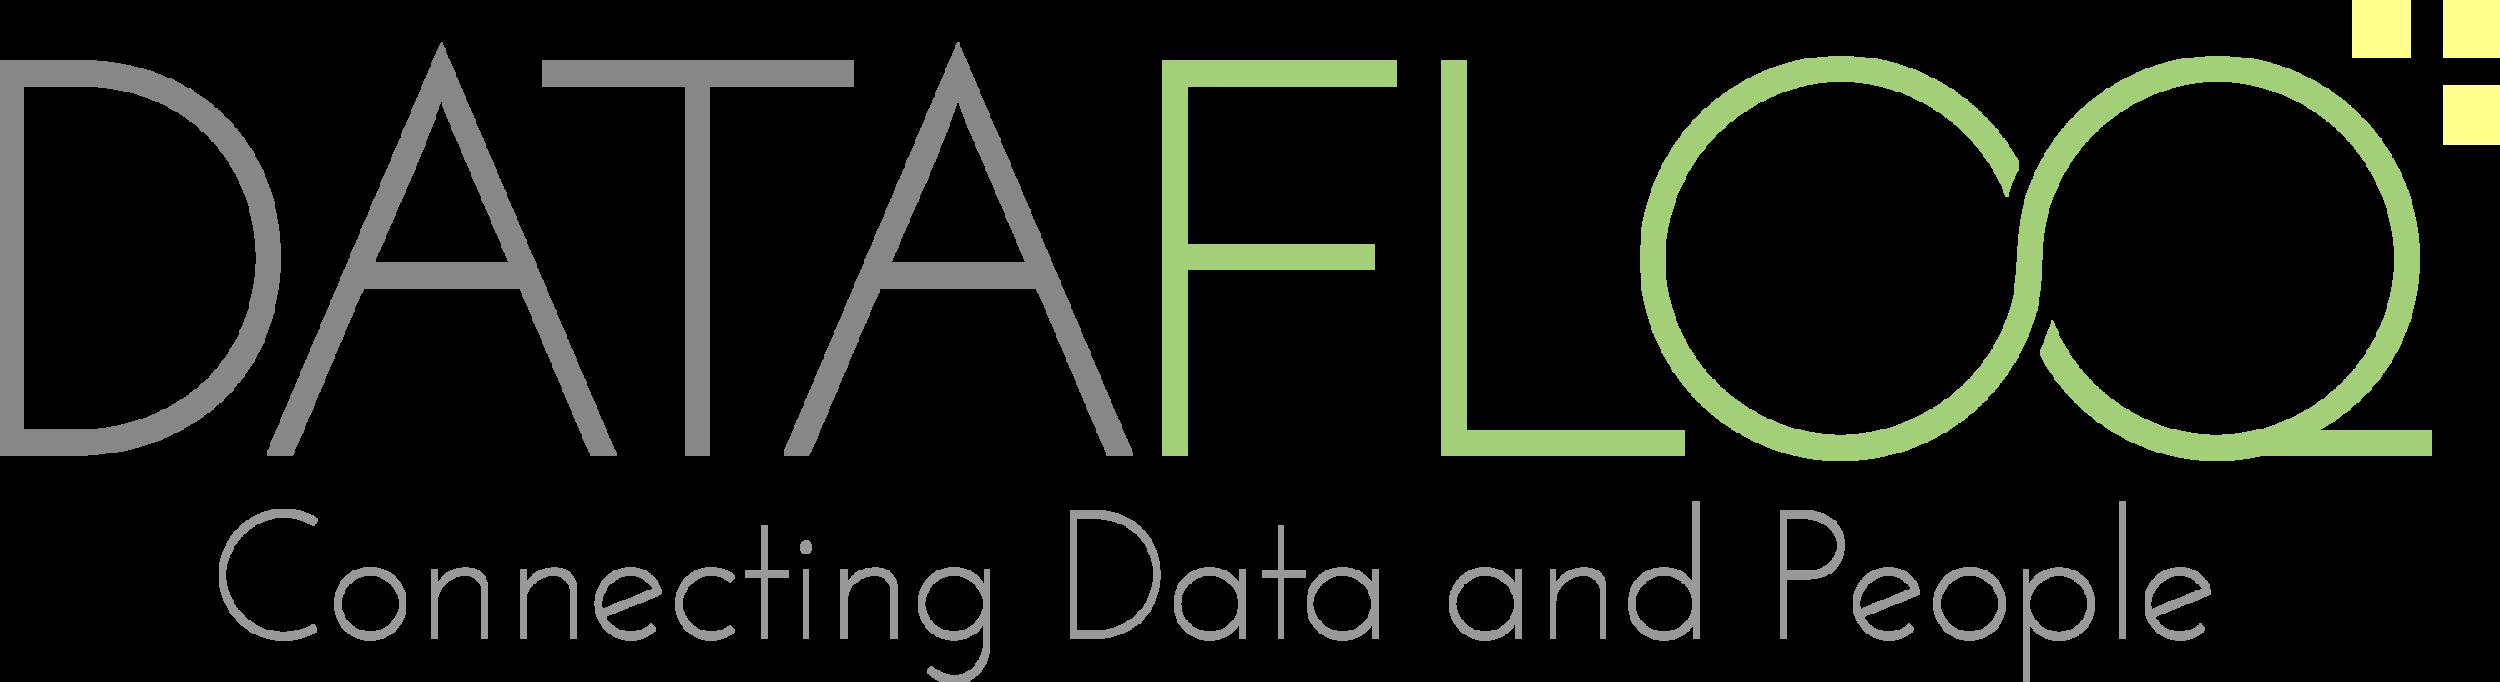 Datafloq_Logo_Web.png